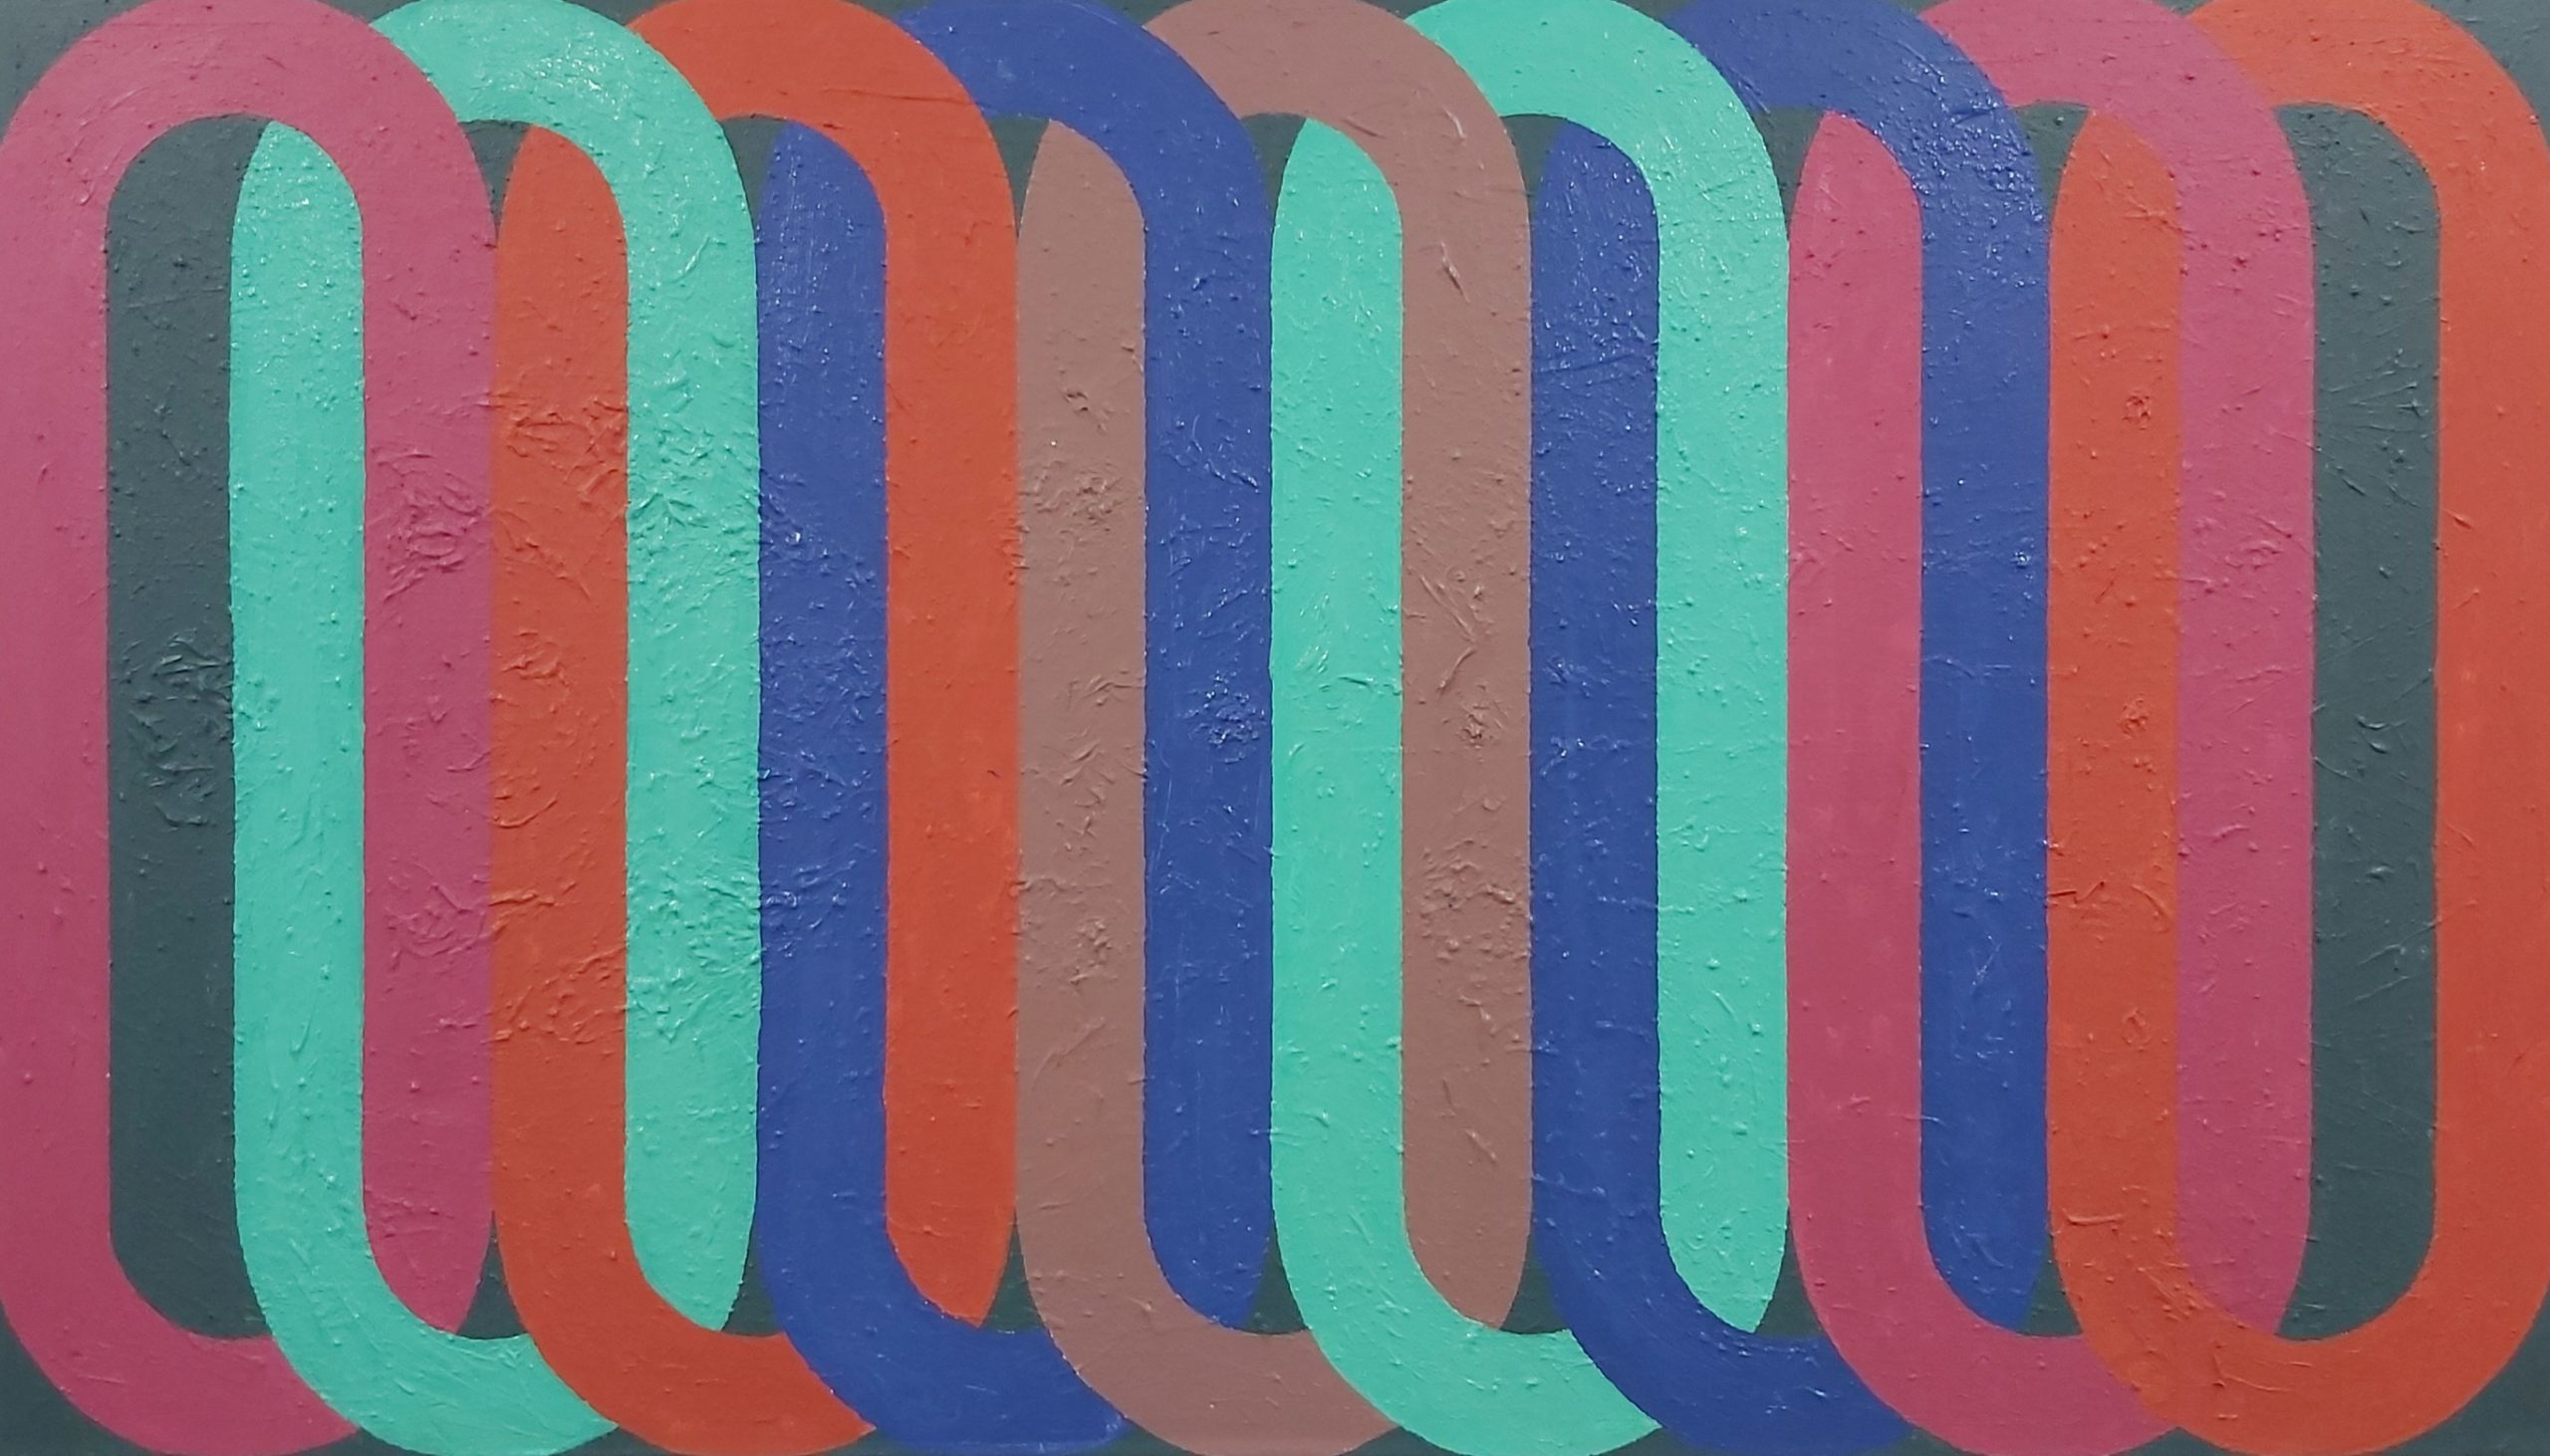 La Source 2019 Acrylic on Canvas 91.5 x160.5 cm